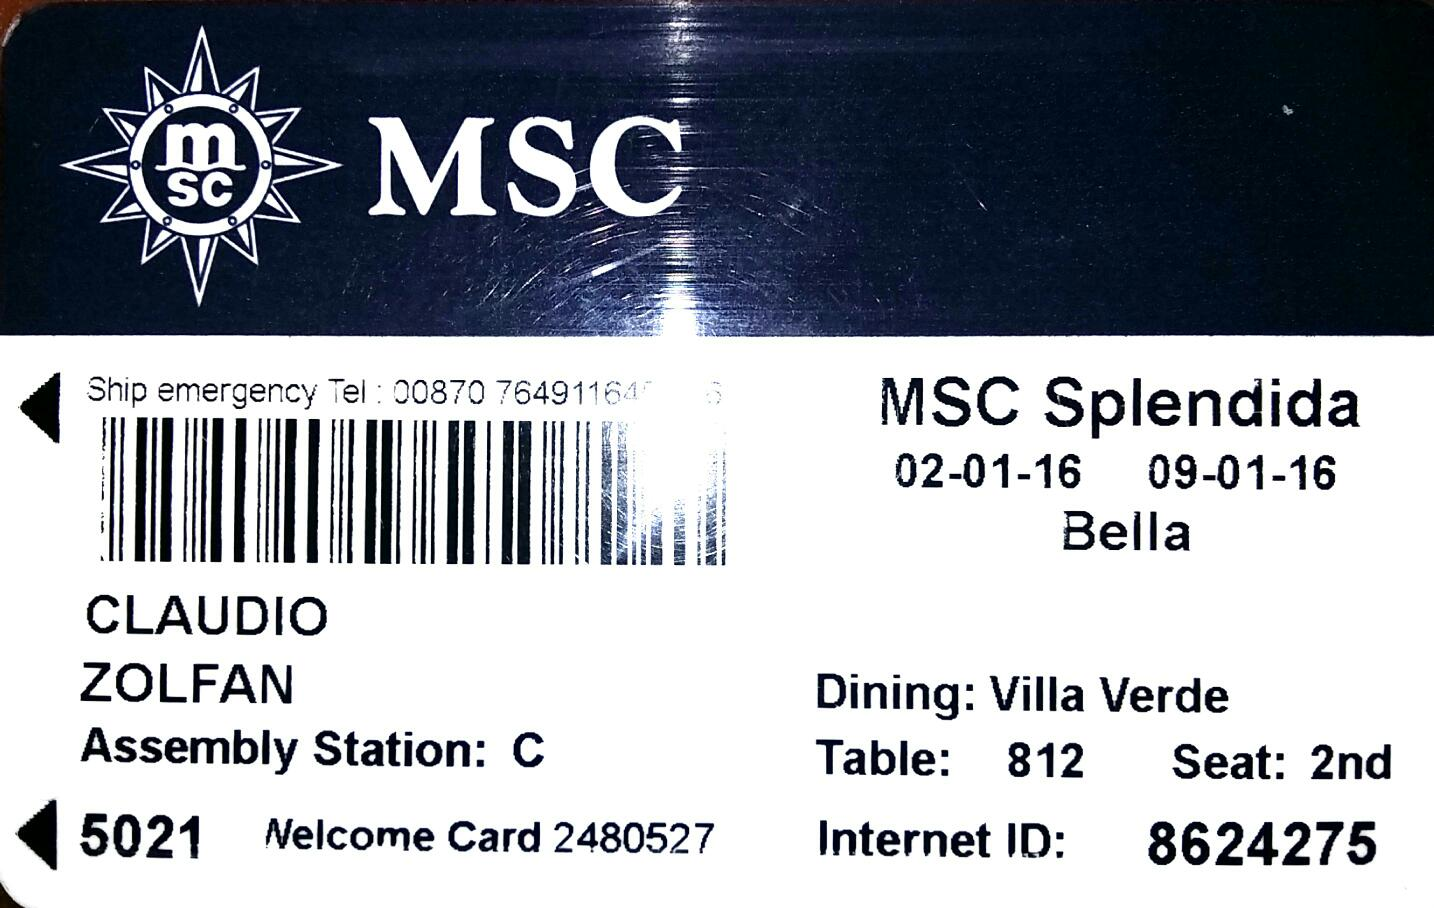 MSC Splendida Professional Photo